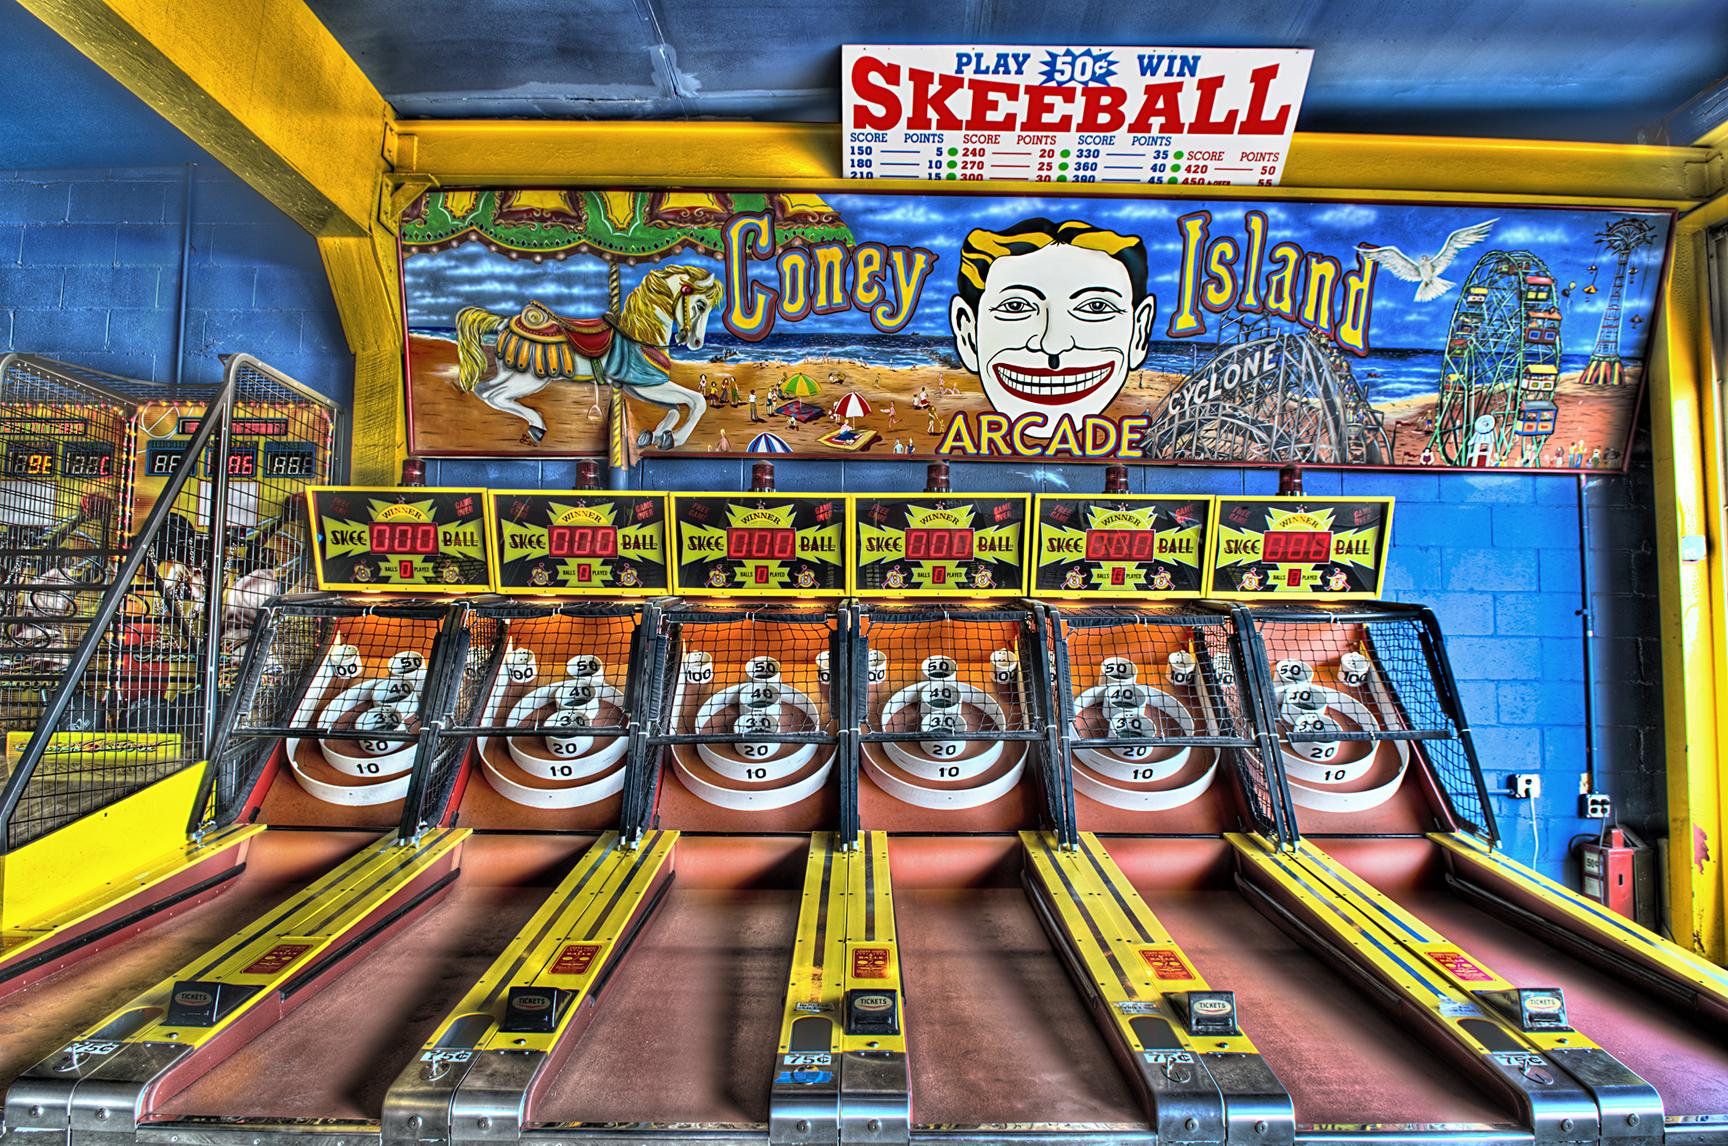 SkeeBall, Coney Island, NYC